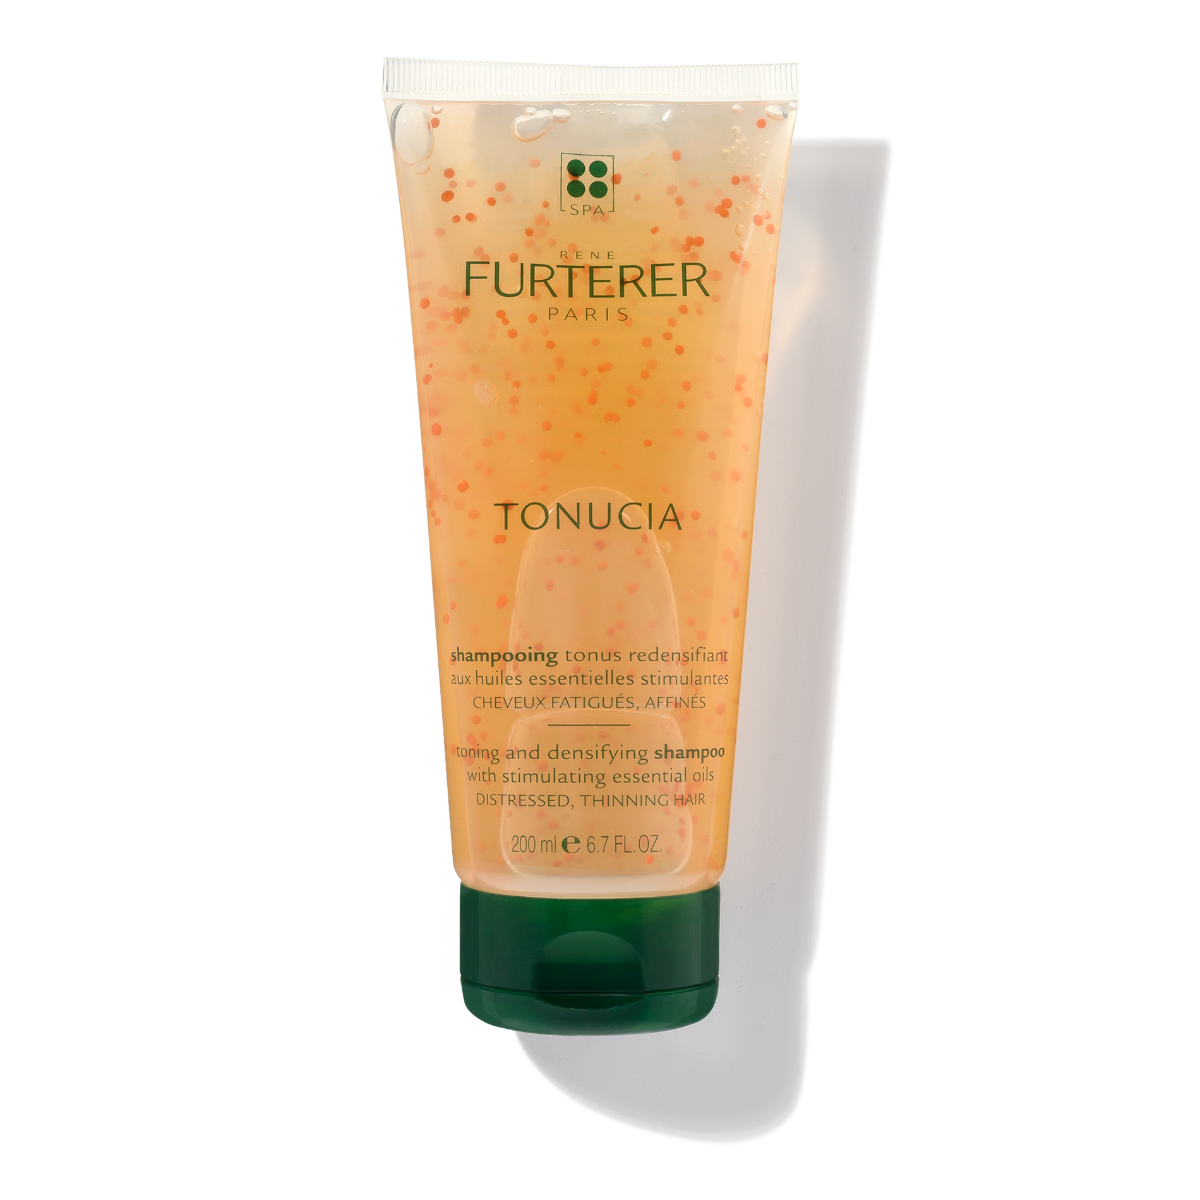 Rene Furterer TONUCIA Toning and Densifying Shampoo